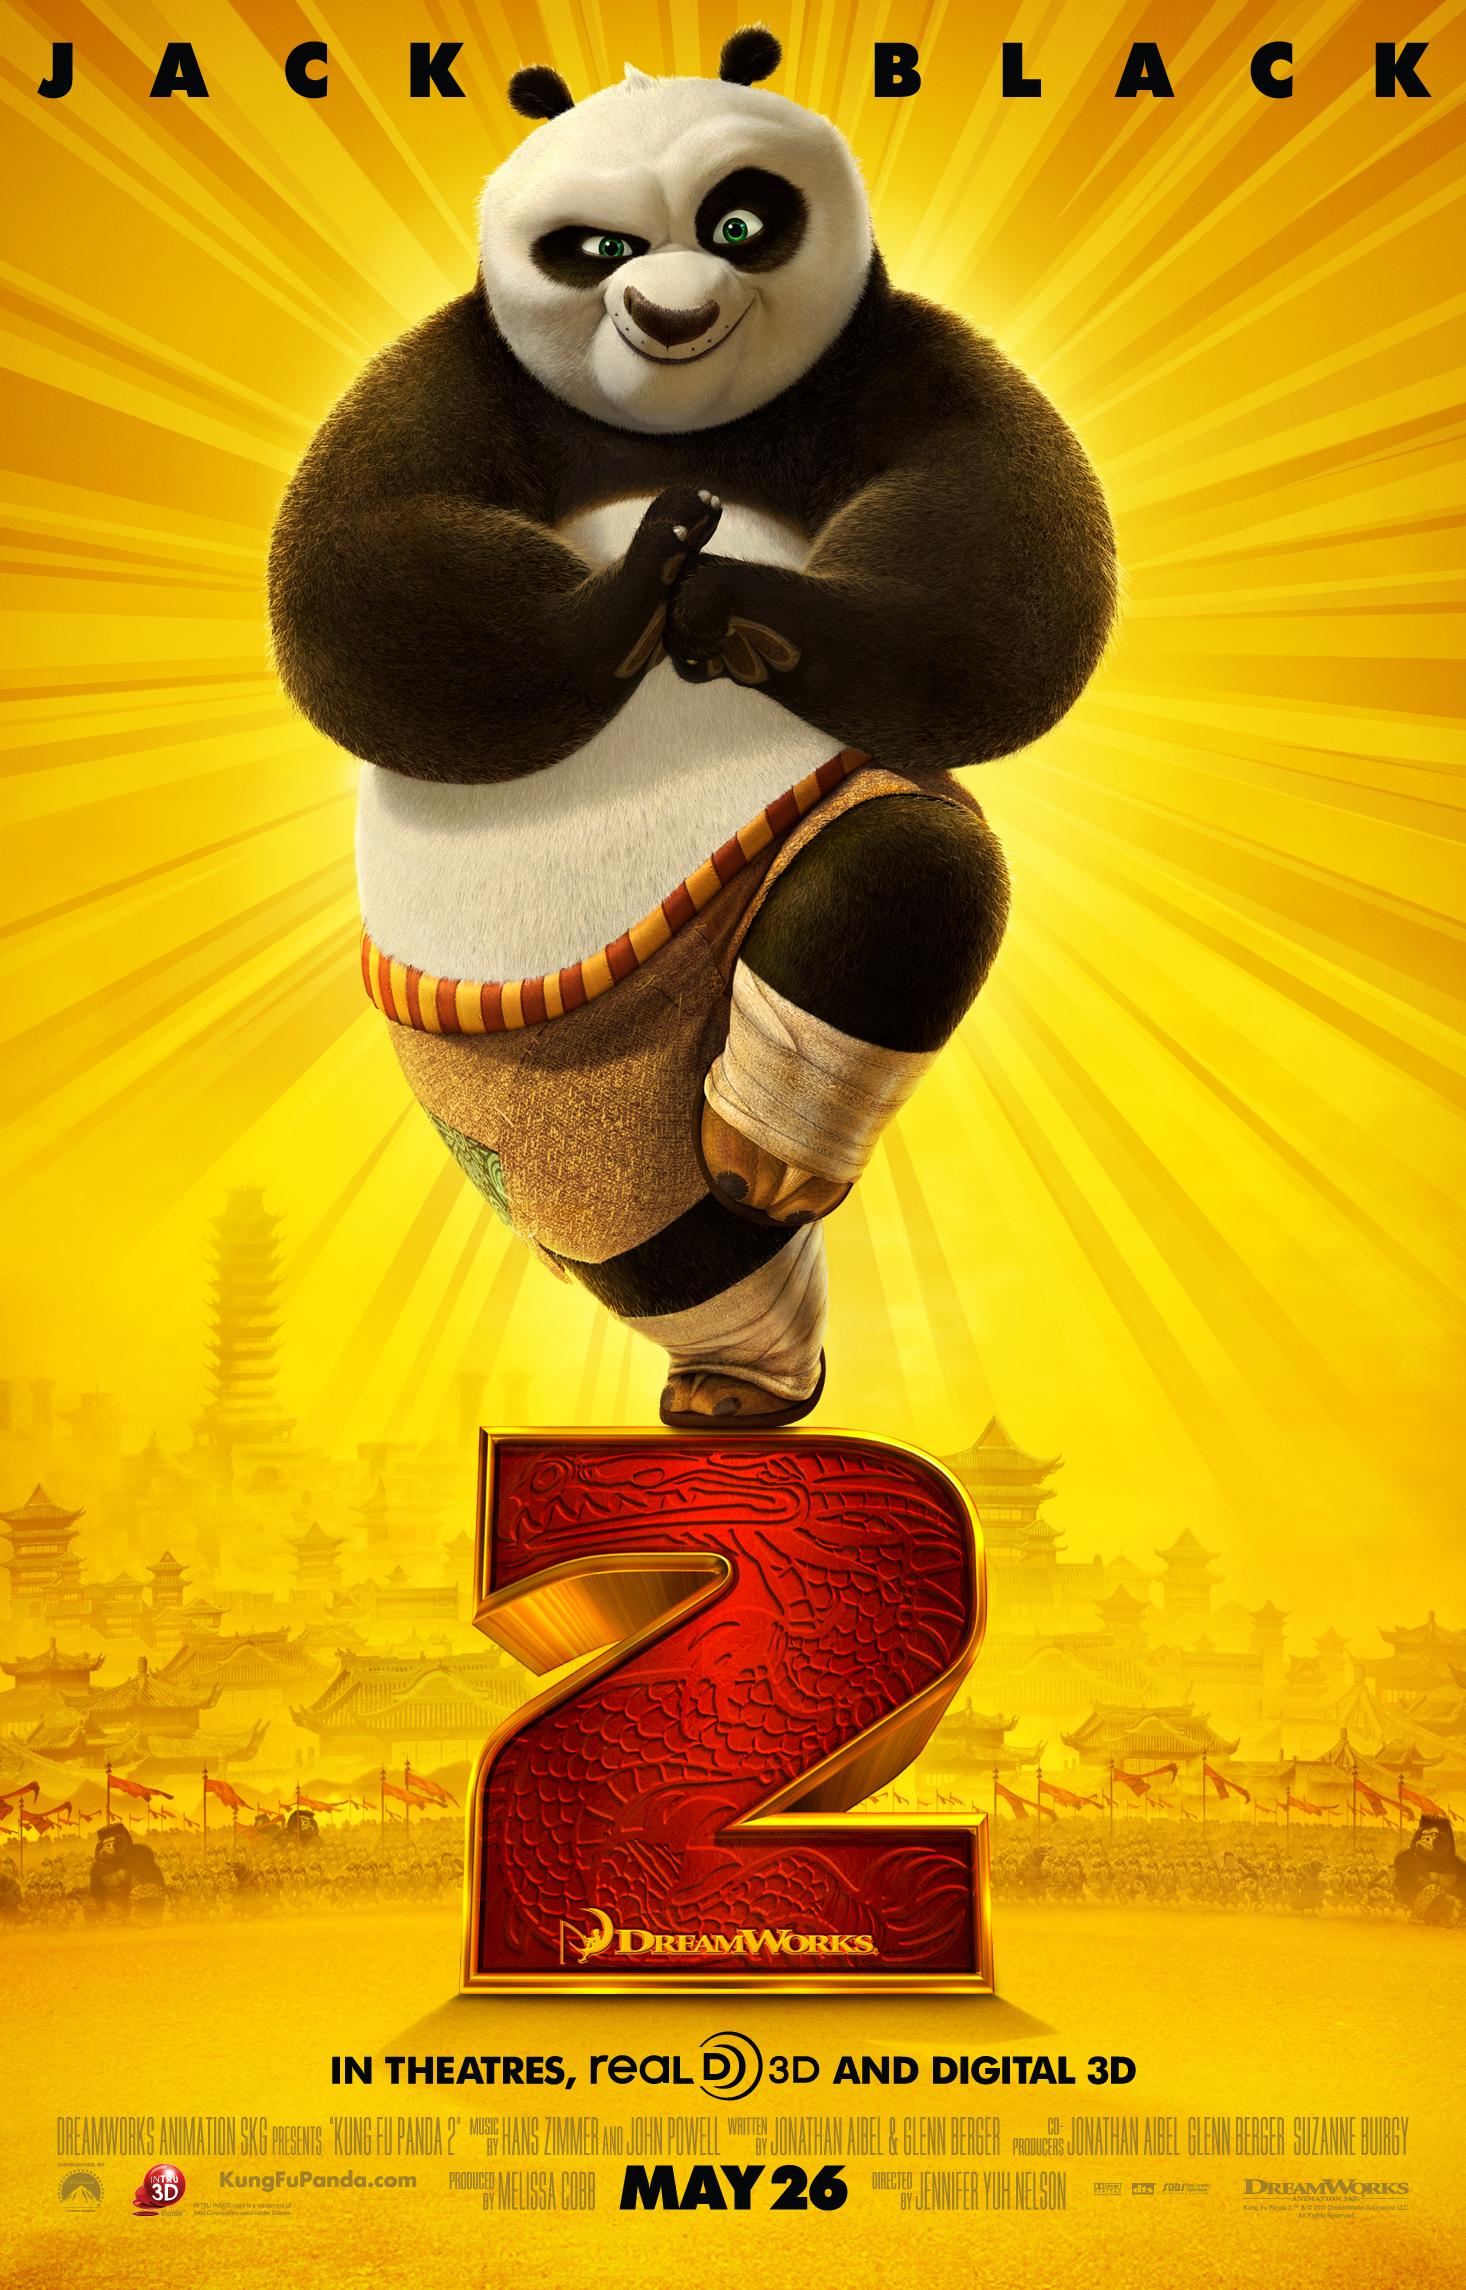 fu kung panda dvd wiki po poster wikia kungfu dragon film sad awesome